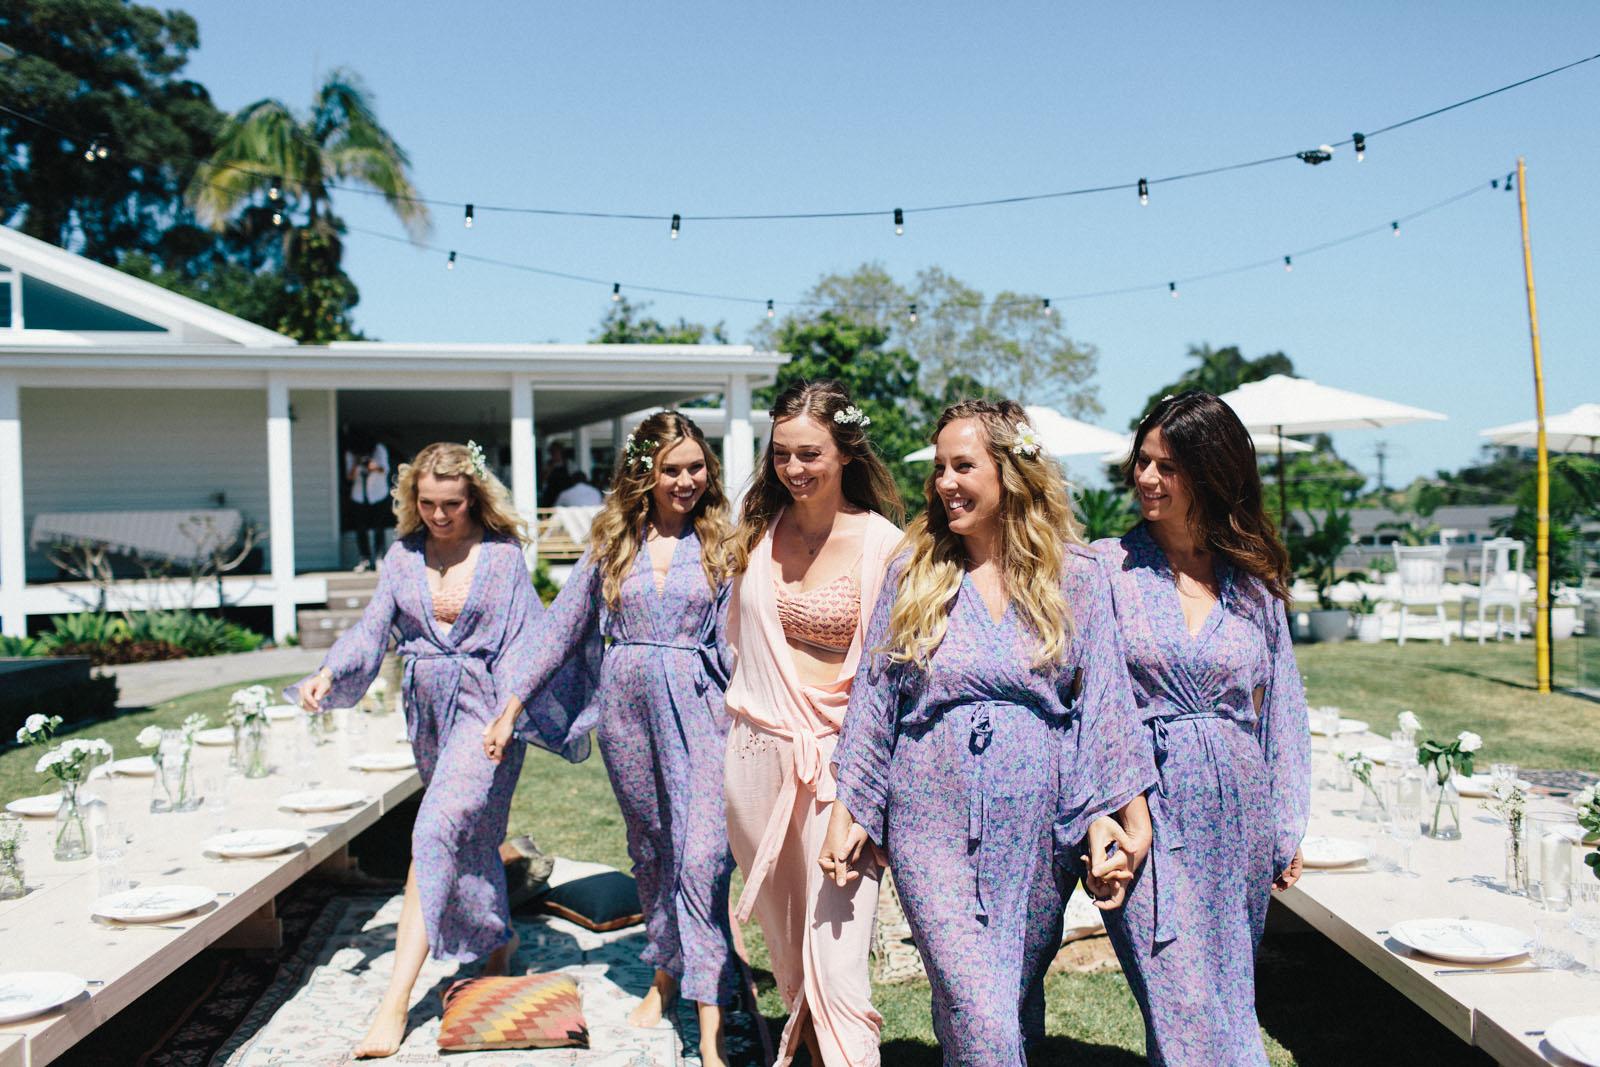 Lizzy + Johnny | Byron Bay Wedding Venue | The Events Lounge - Byron Bay Wedding Planner and Stylist - www.theeventslounge.com.au